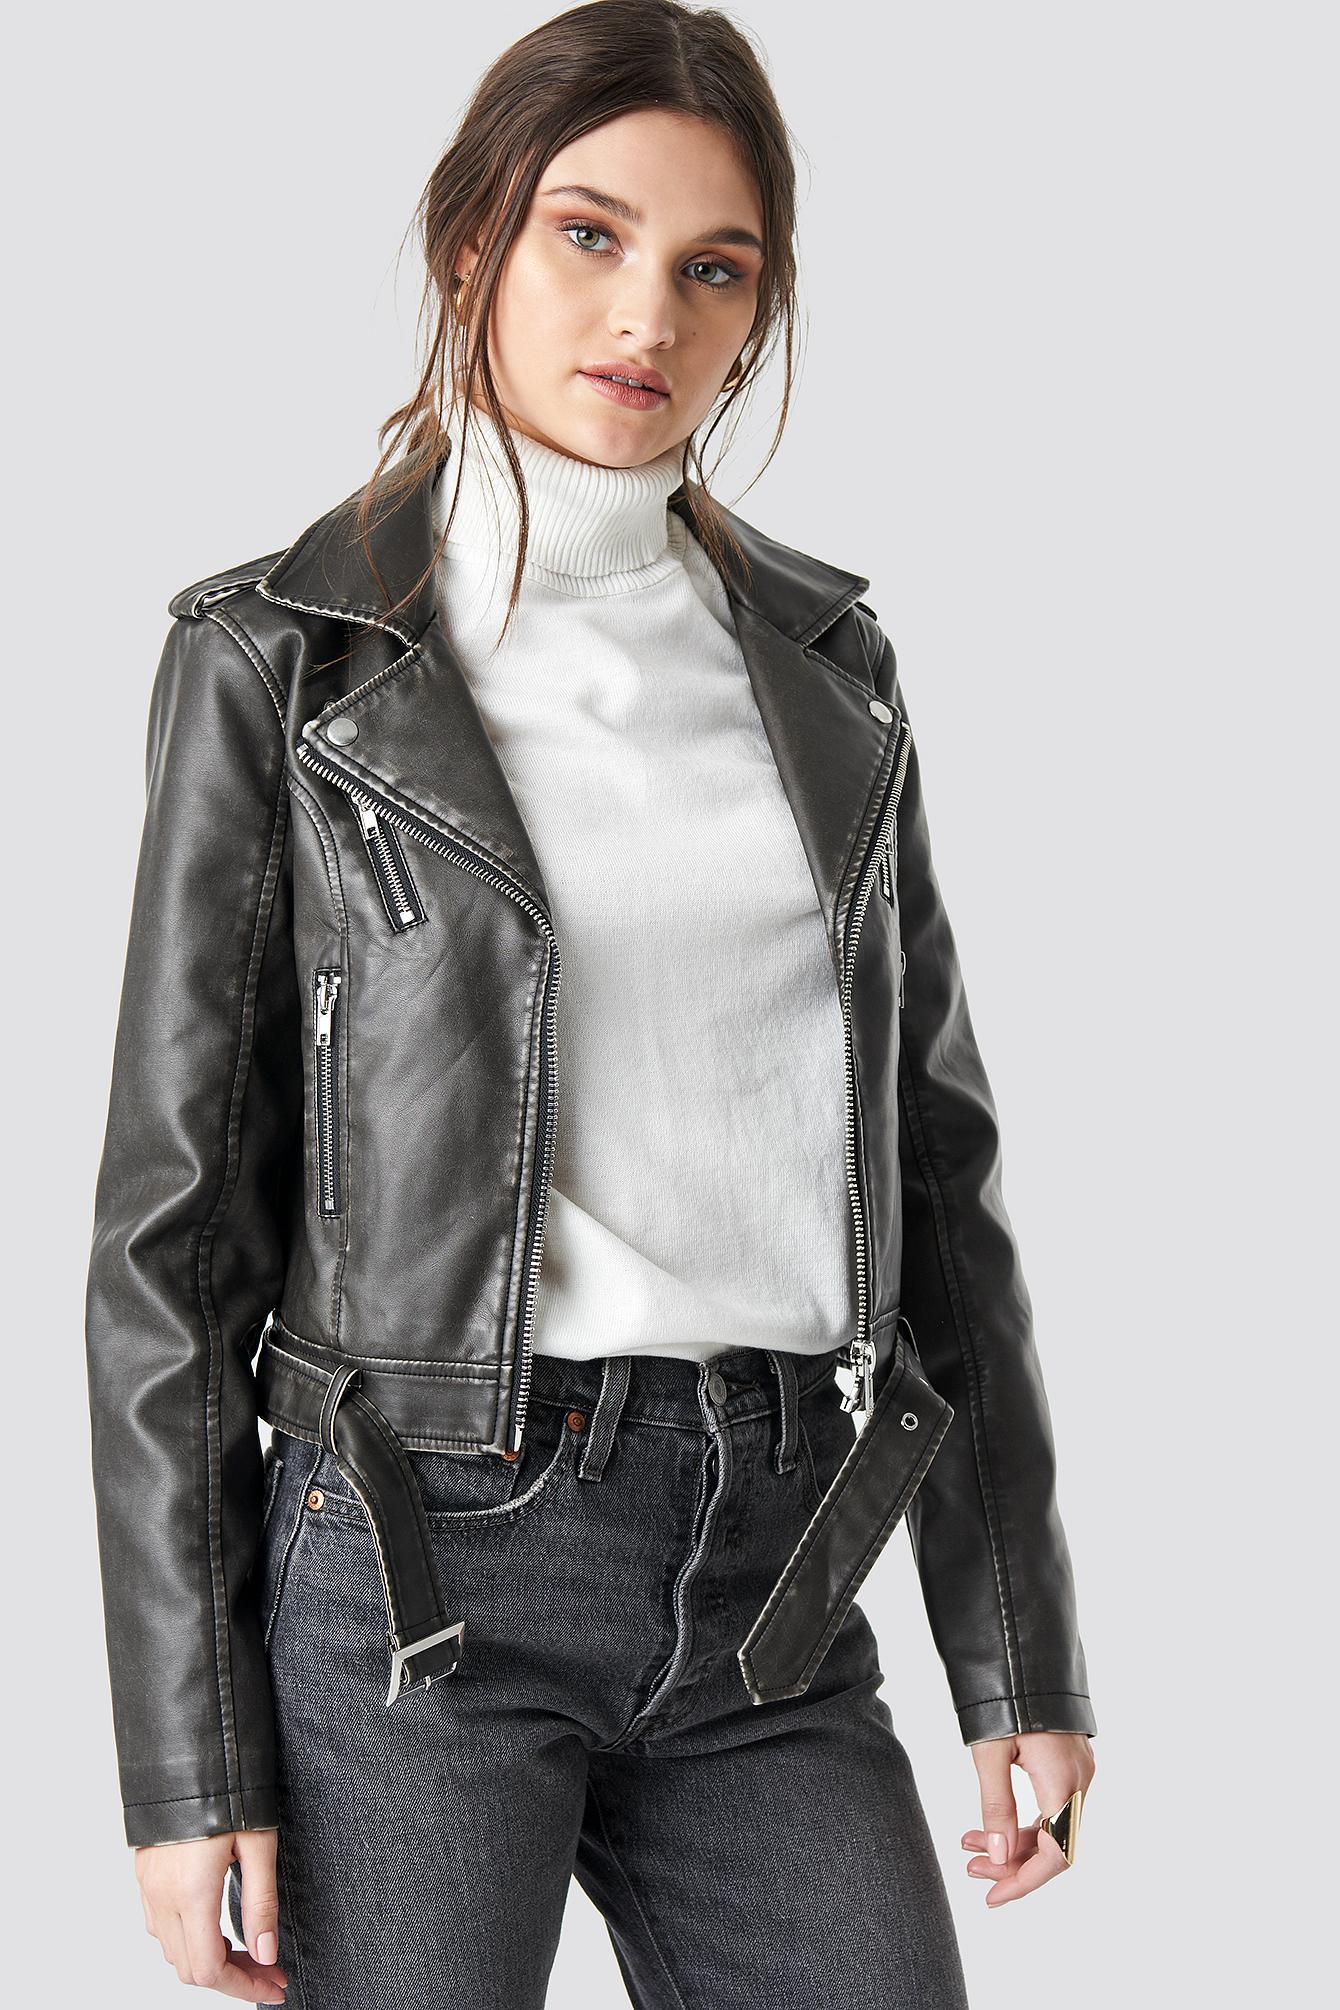 NA-KD Pu Leather Heart Biker Jacket Black/red Print - Lyst